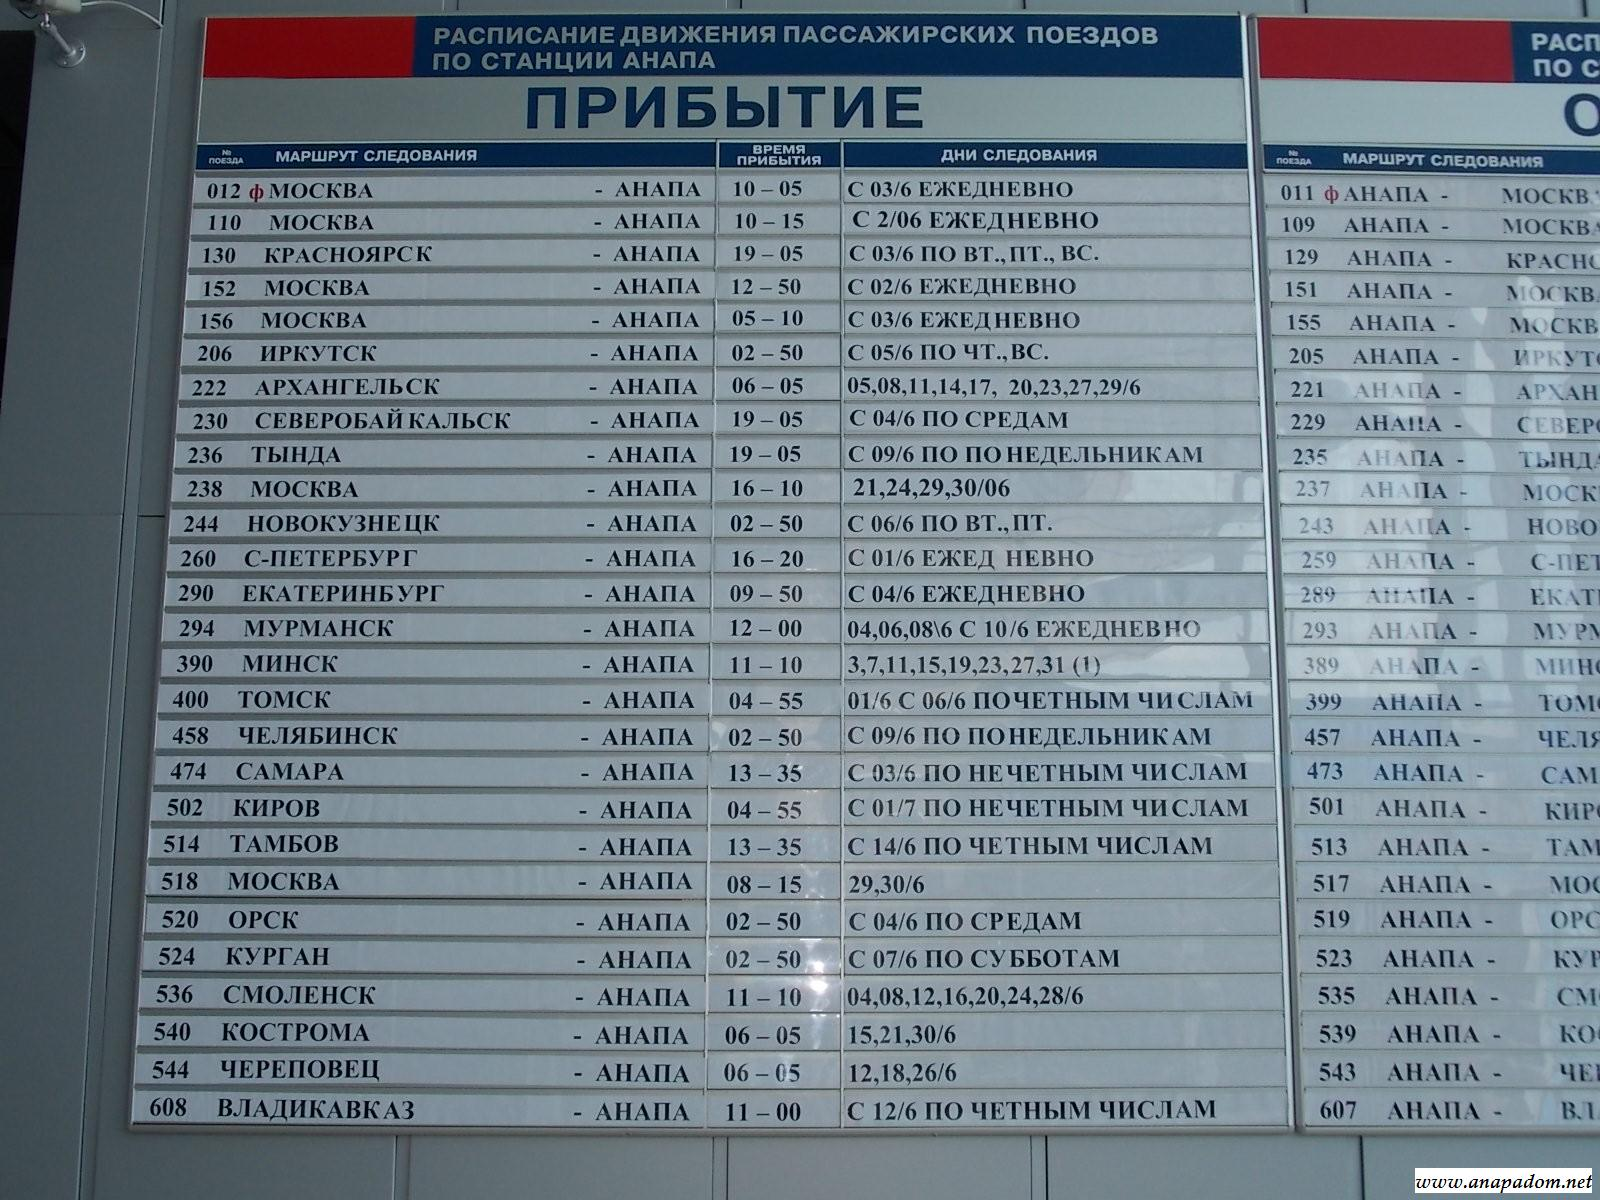 цена билета на поезд архангельск анапа 2016 год термобелья Craft Baselayer